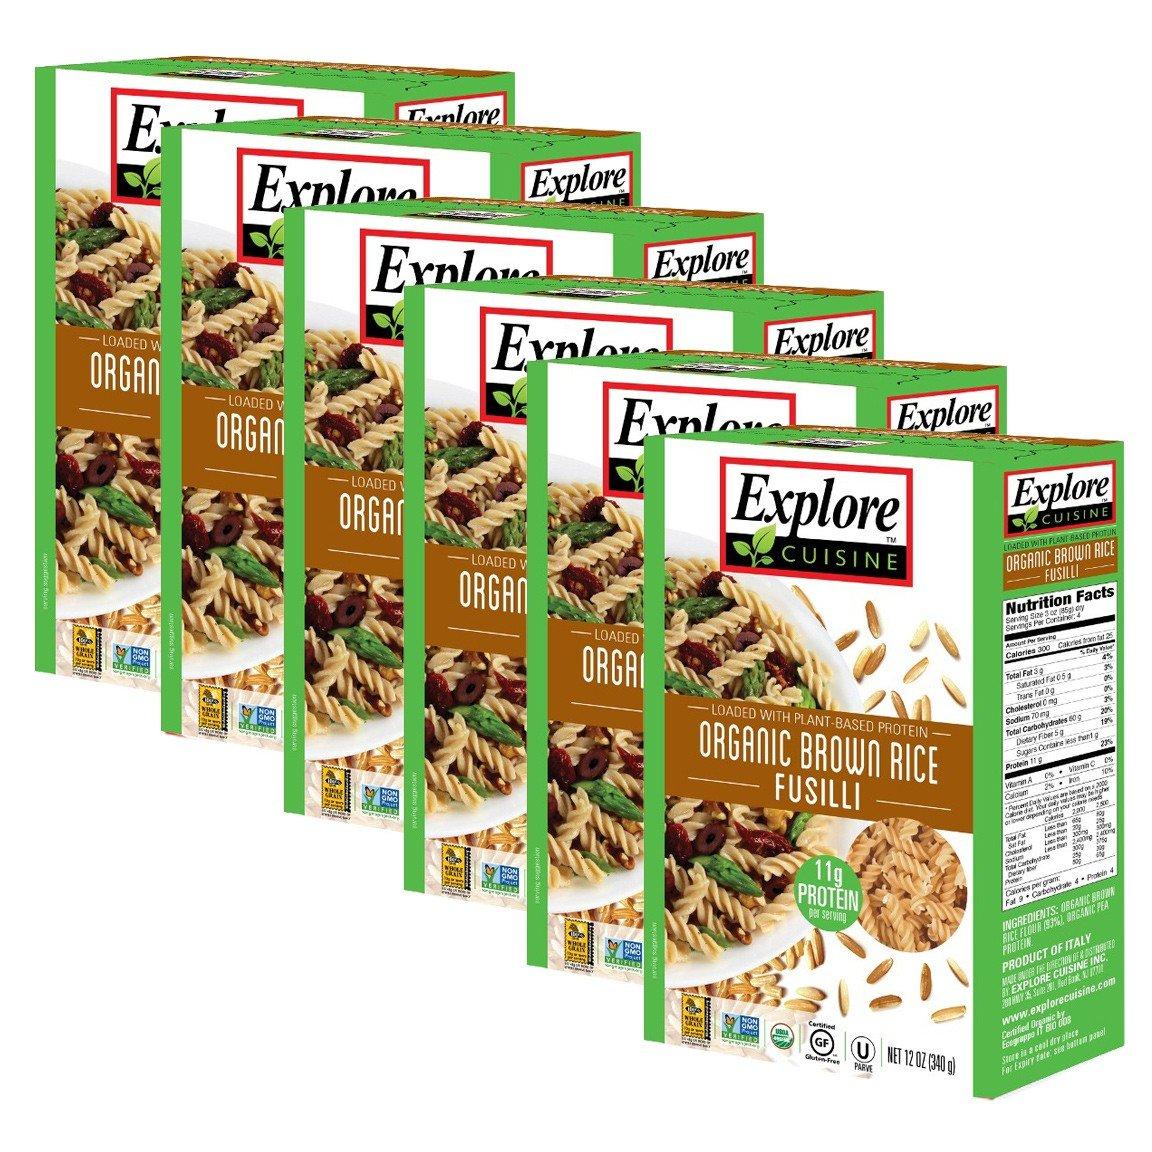 Explore Cuisine Organic Brown Rice Fusilli, Organic, Gluten Free, non-GMO Verified, 12 oz (Pack of 6) by EXPLORE CUISINE